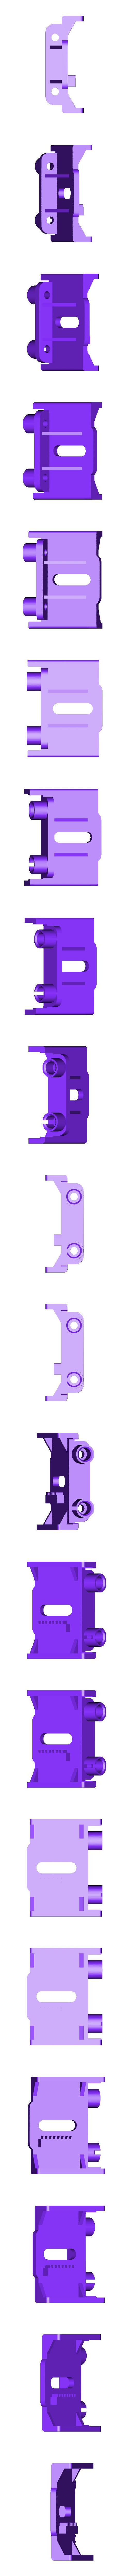 Level_Mech_4.stl Download free STL file Oculus Rift DK2 • 3D printing object, indigo4